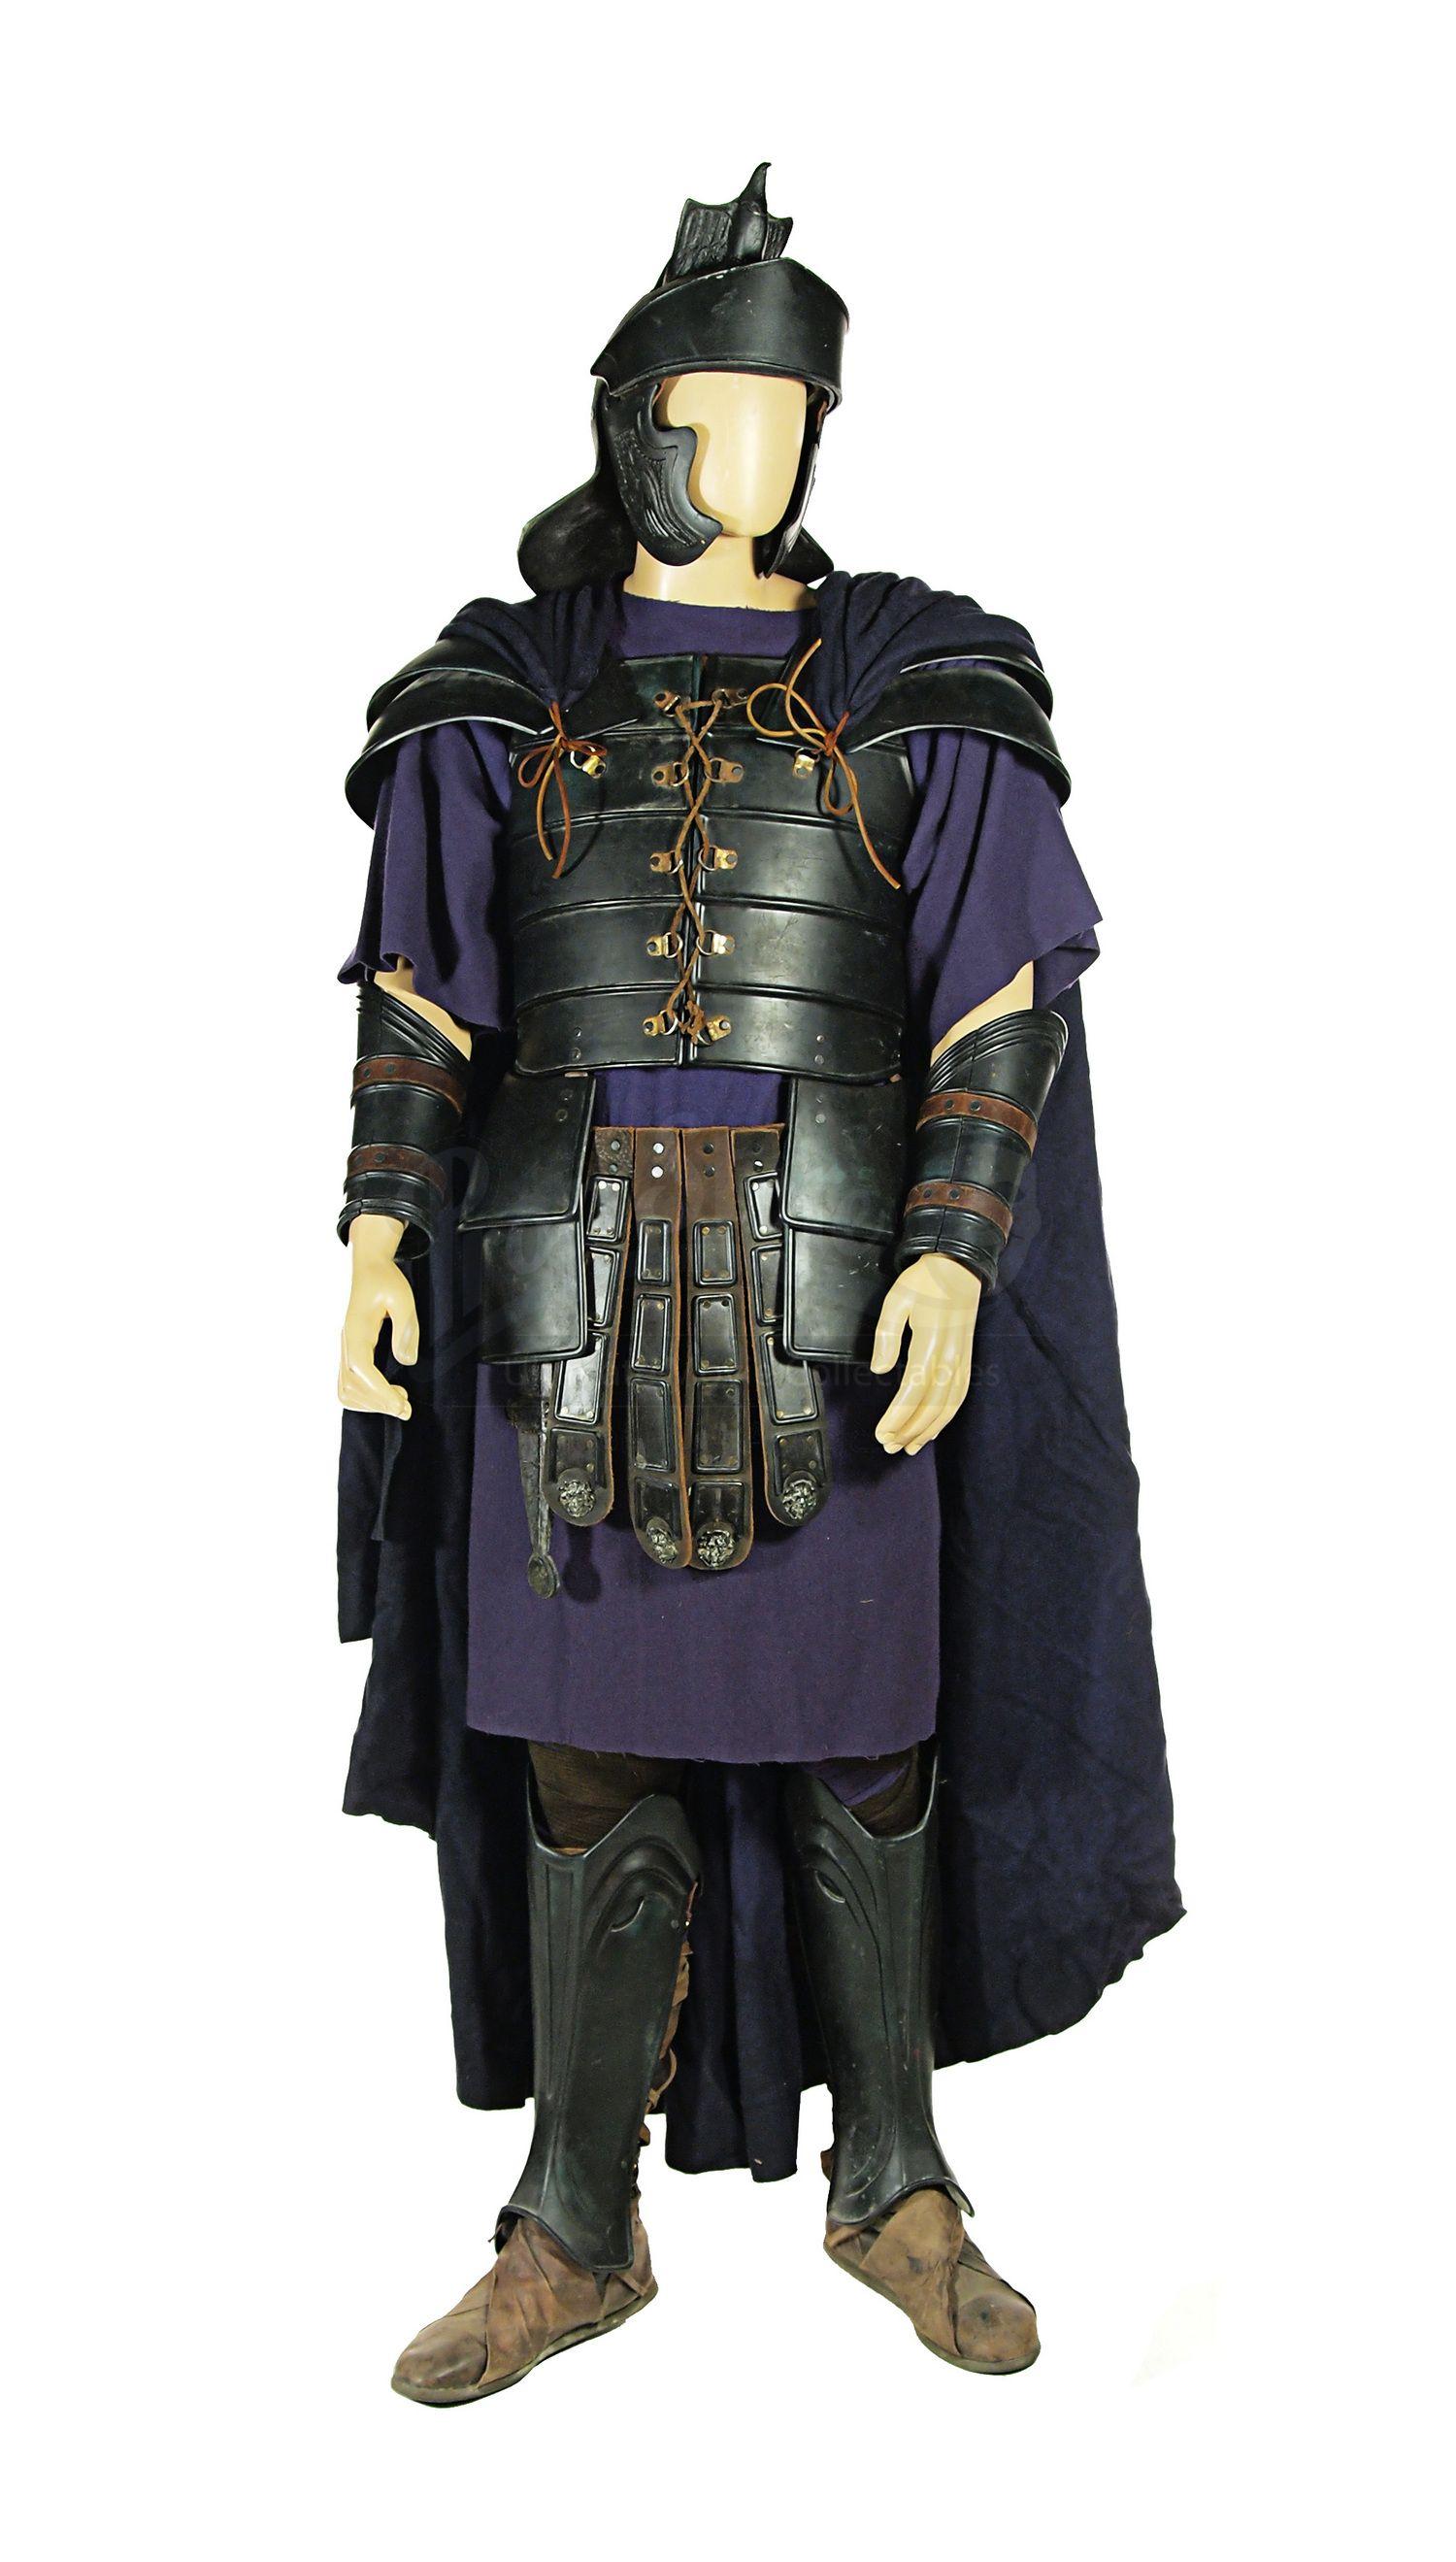 Praetorian Guard Costume from the movie Gladiator ...